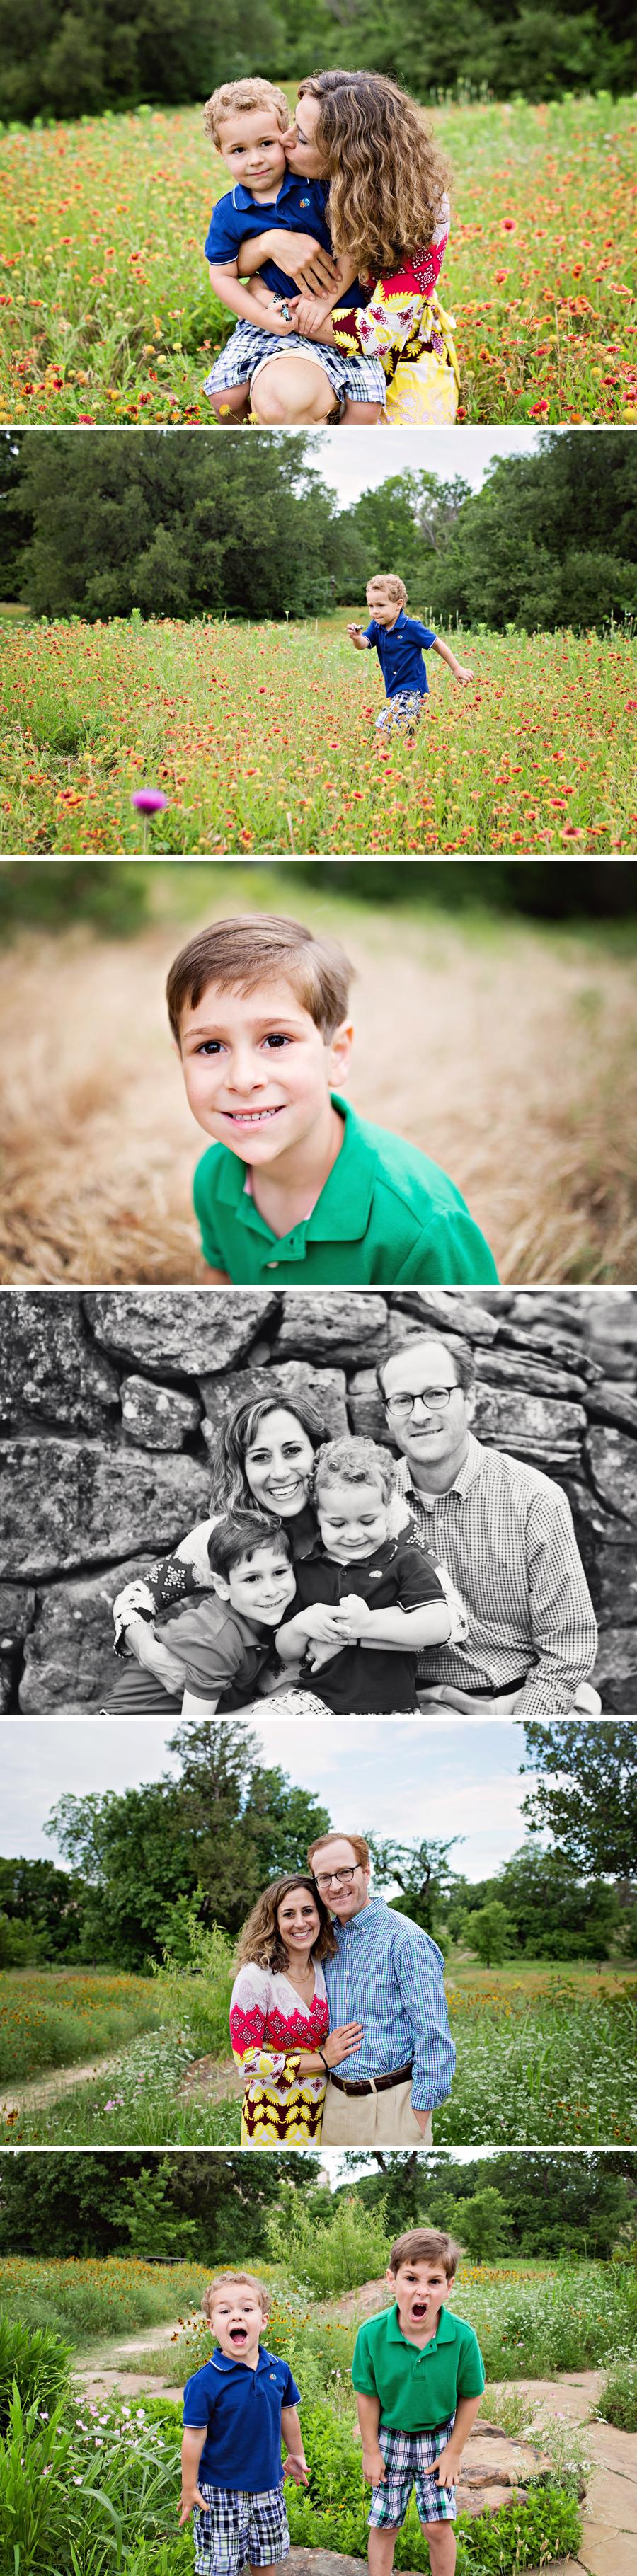 Dallas-Family-Photographer003